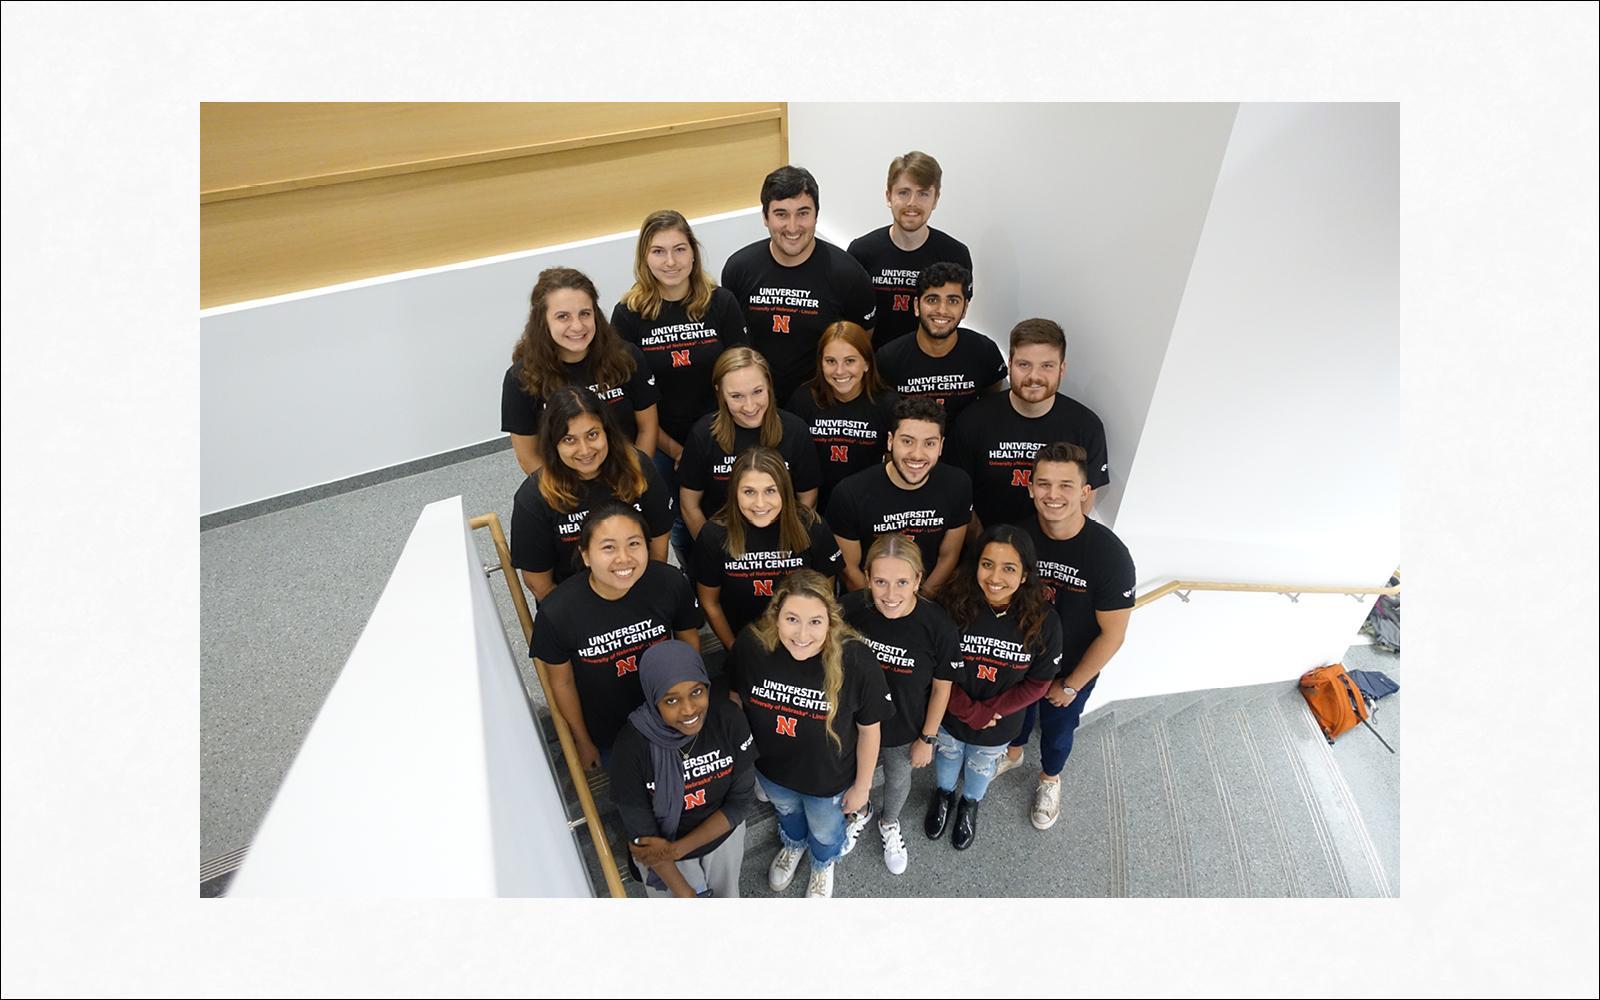 2019-20 Student Advisory Board members